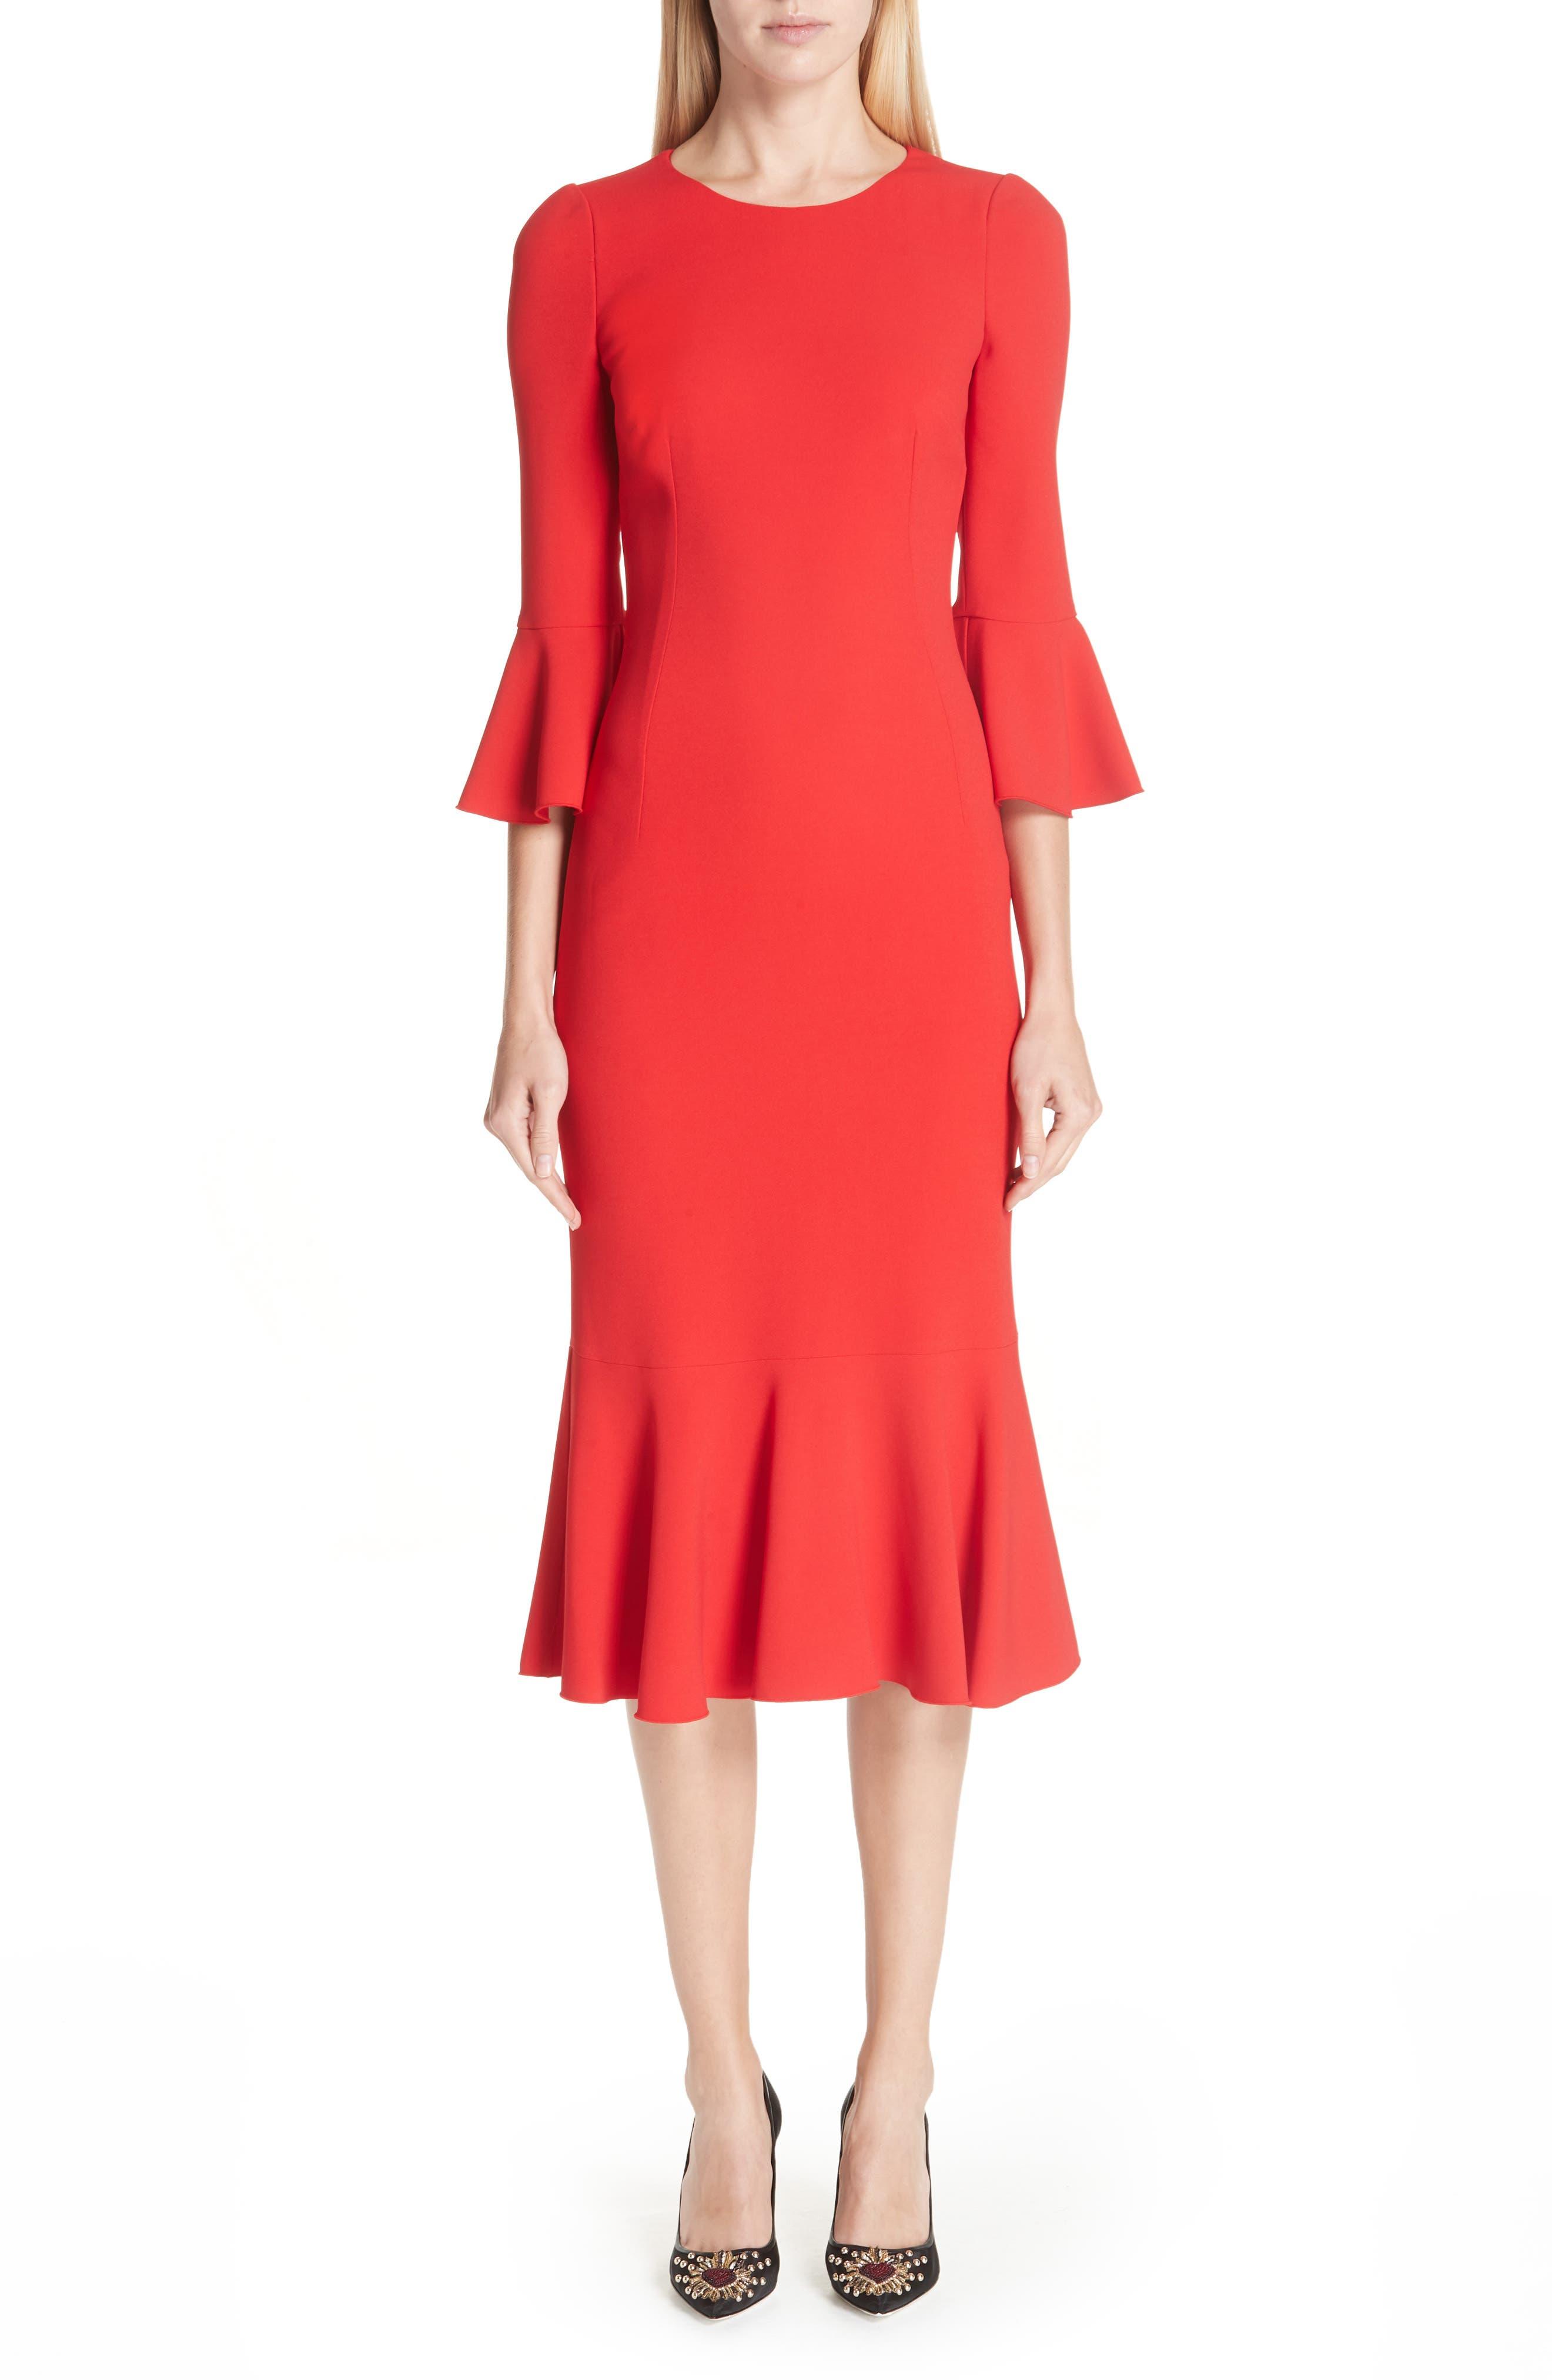 Dolce & gabbana Ruffle Hem Dress, US / 40 IT - Red